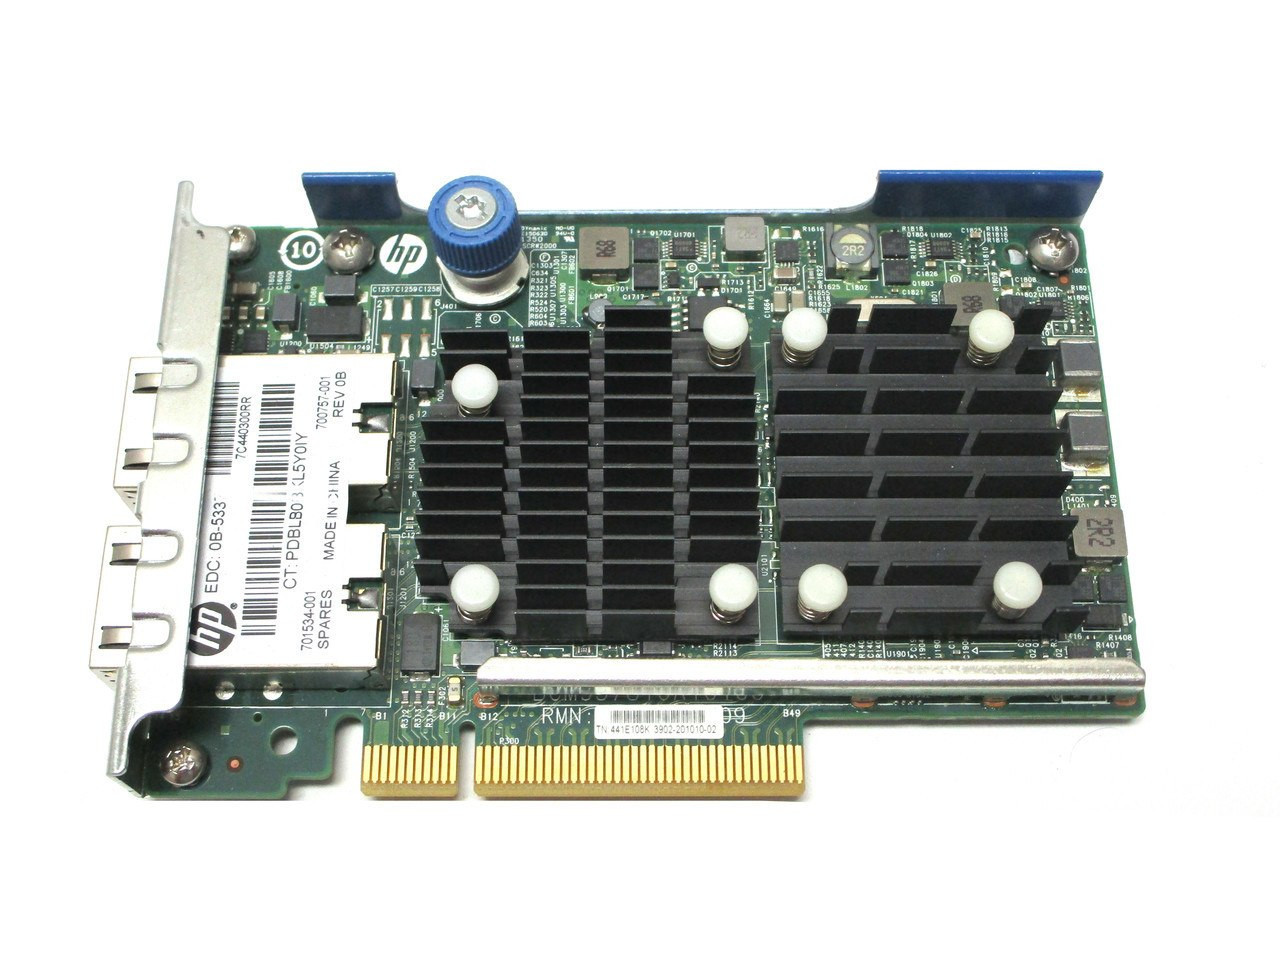 701534-001 HPE FlexFabric 2-port 10 Gbps 533FLR-T adapter700759-B21